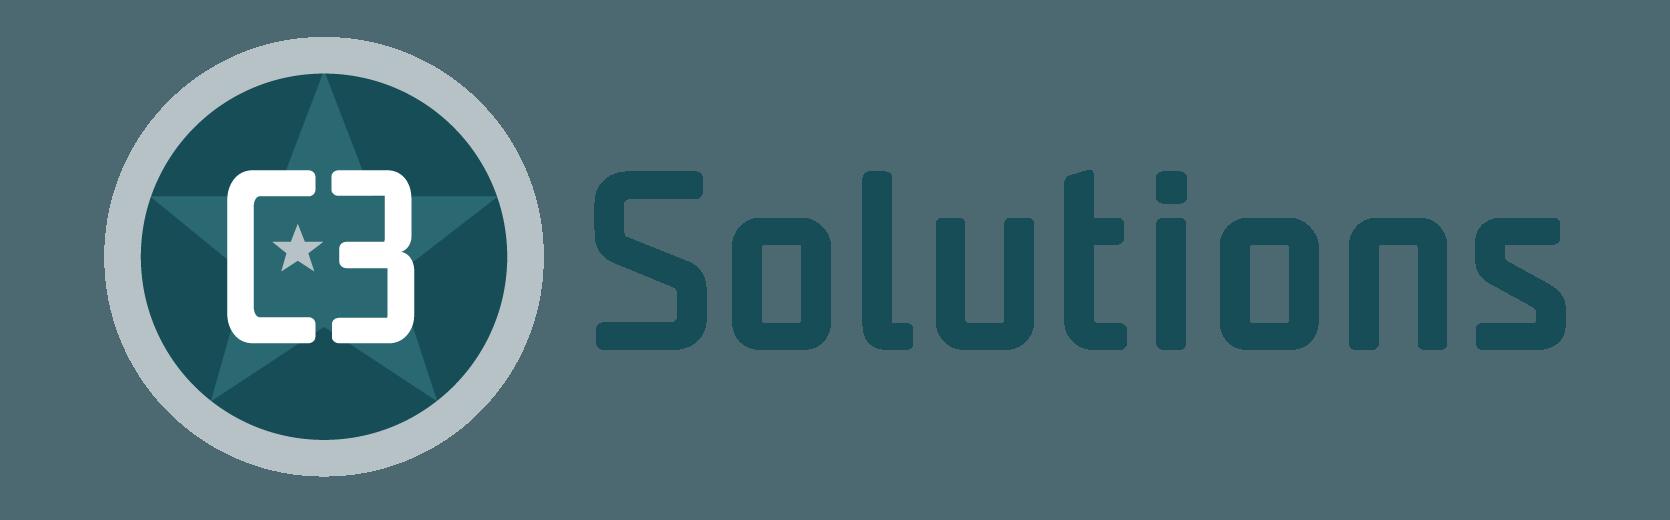 c3solutions-logo-horizontal-light